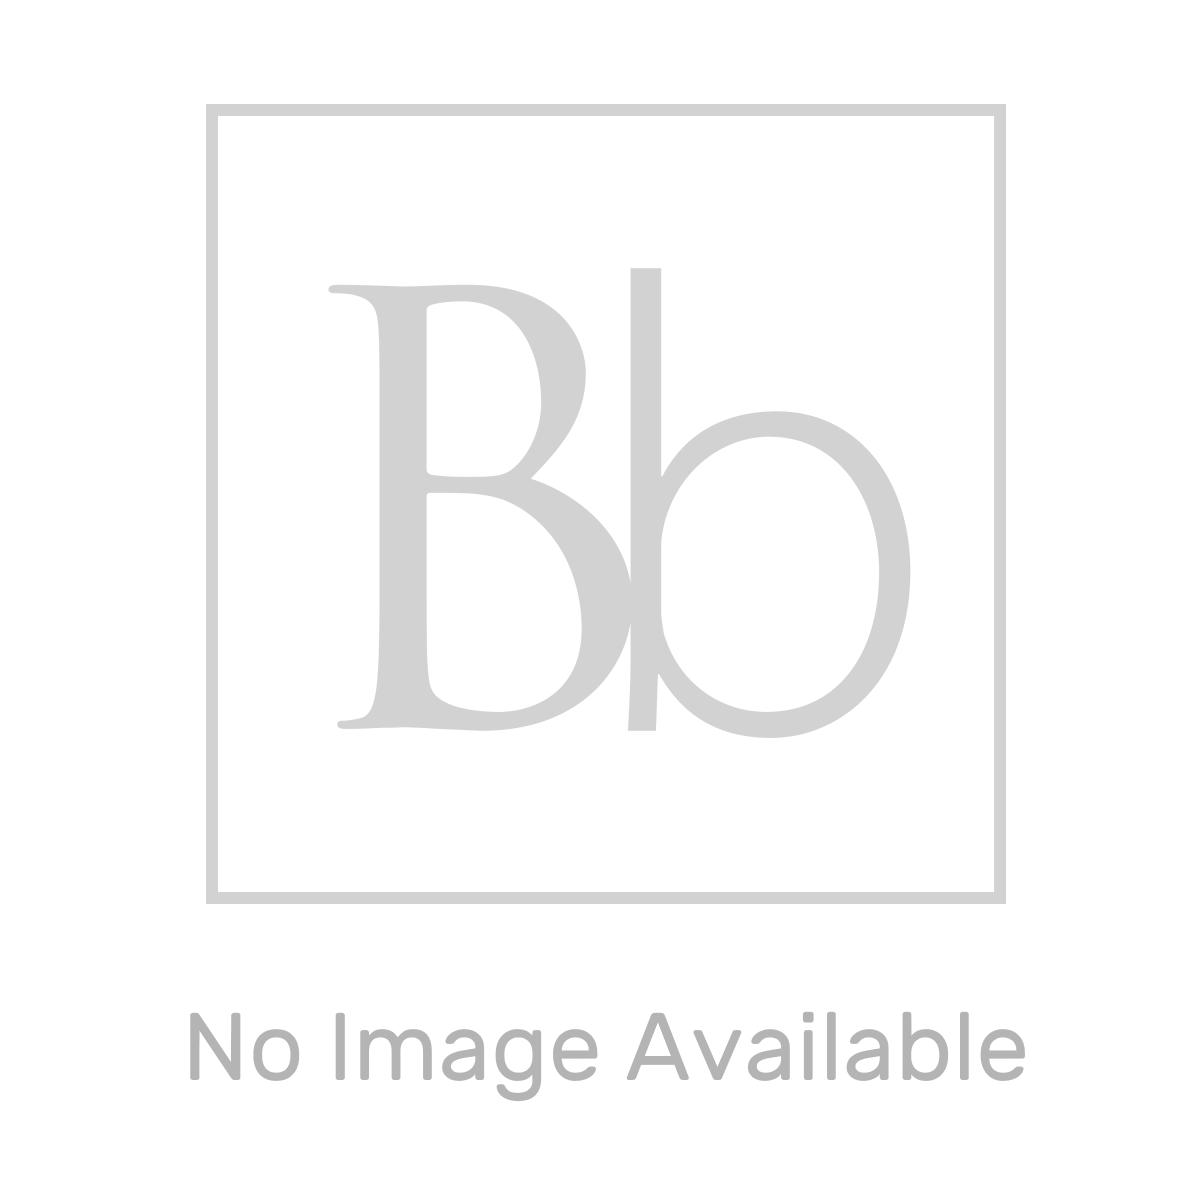 800 x 800 Shower Tray Slate Grey Quadrant Low Profile by Pearlstone